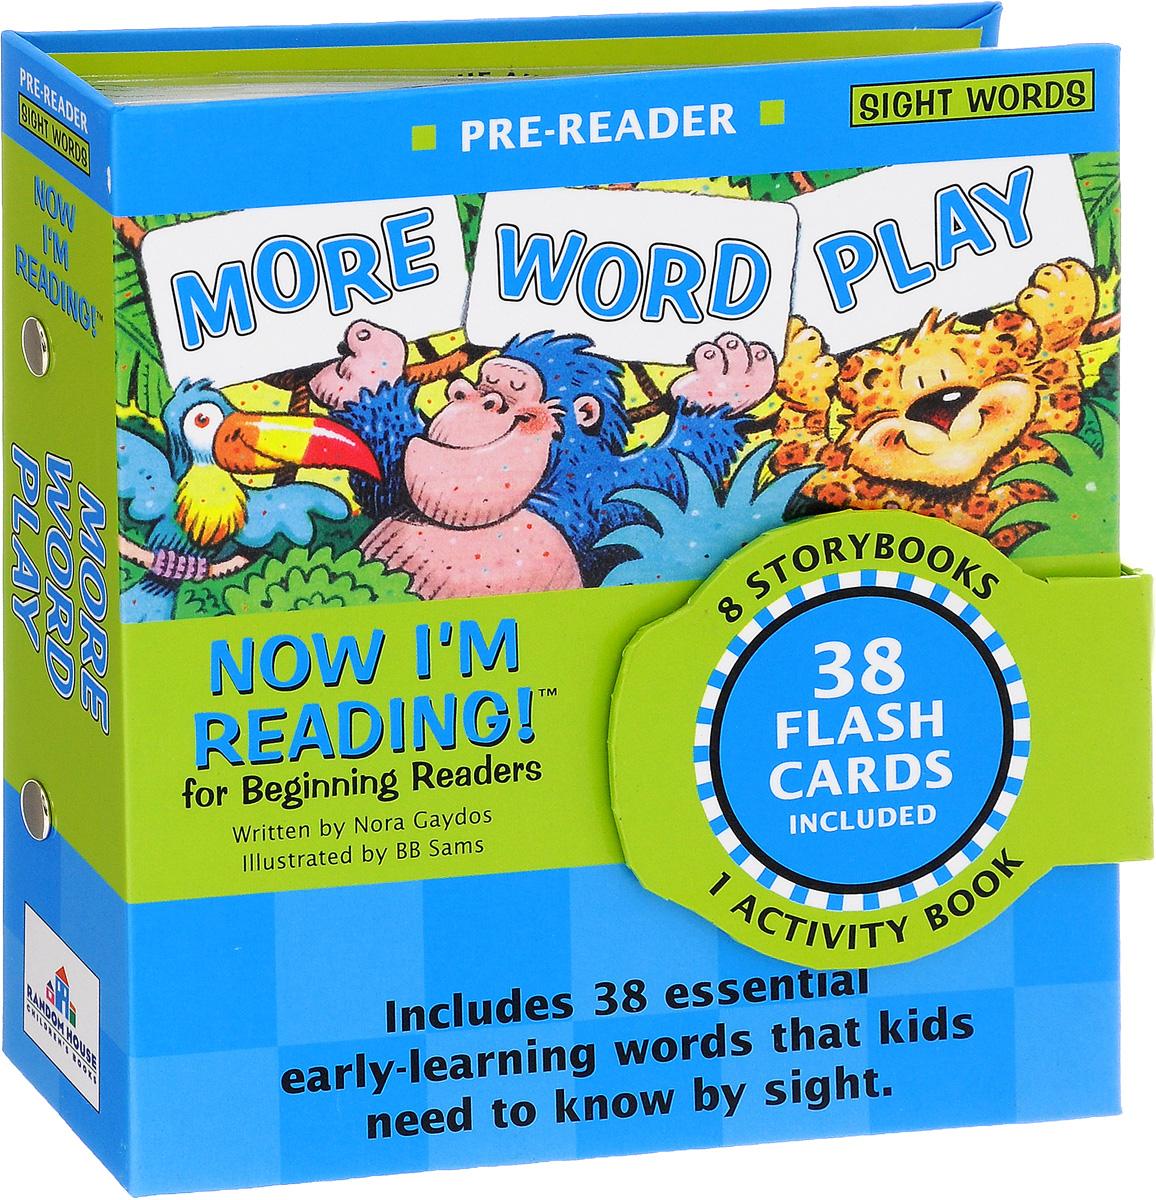 Now I'm Reading!: TNow I'm Reading! Pre-Reader: More Word Play he Best Of Phonics And Literature стол компьютерный васко пс 4002 м1 орех валенсия